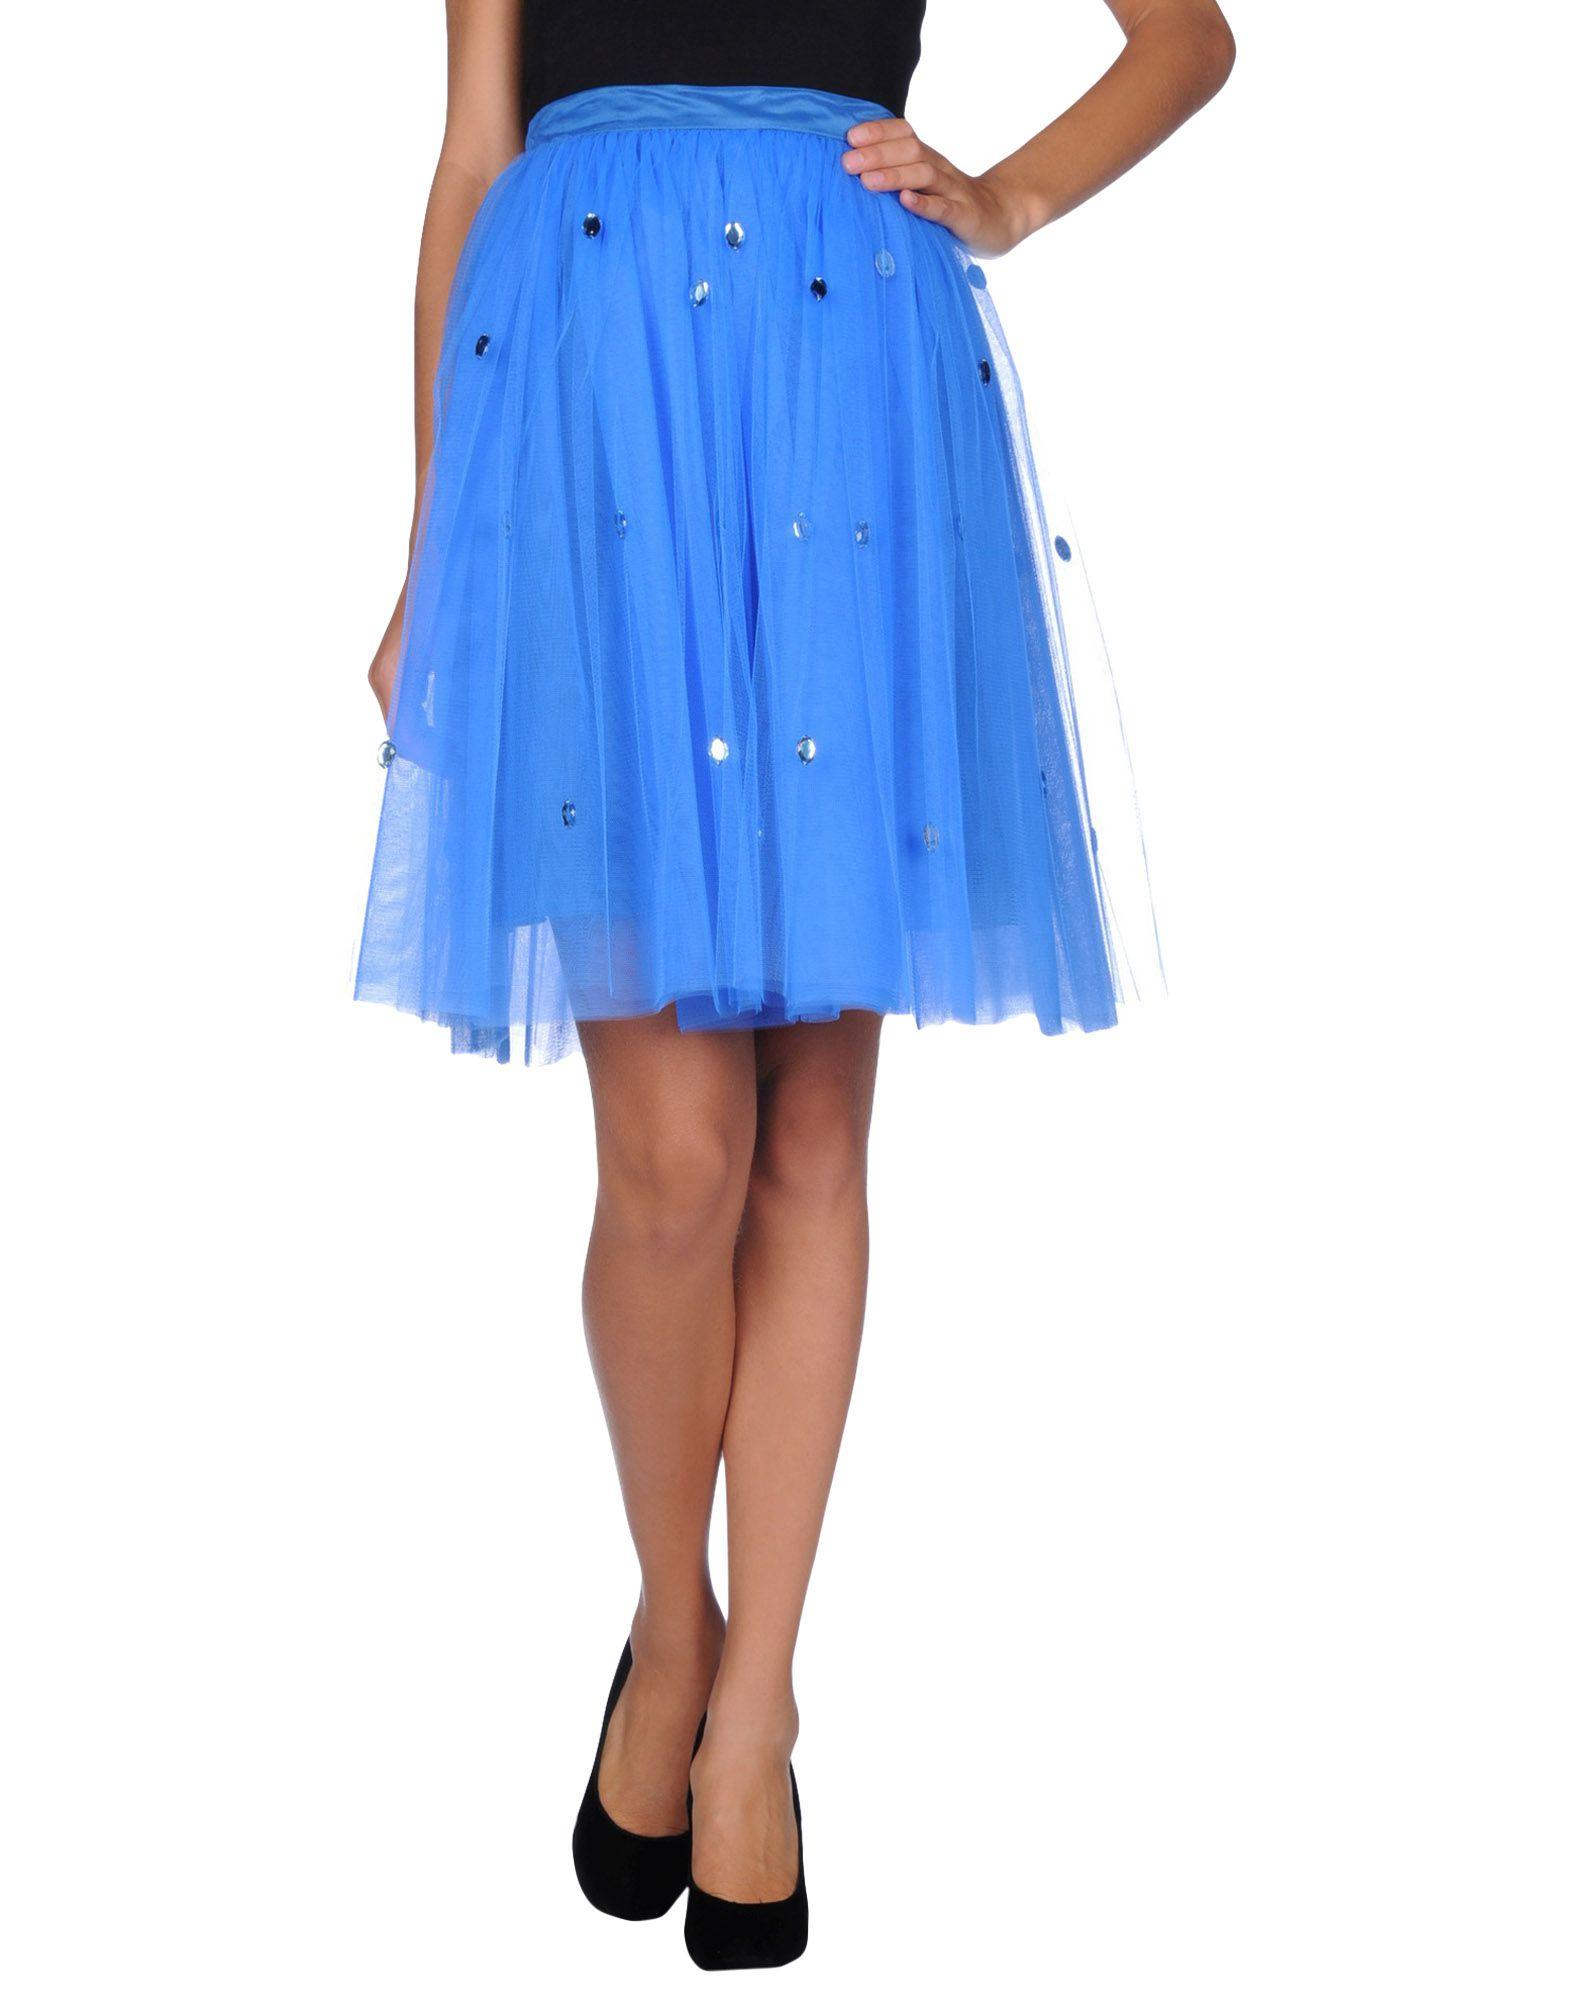 au jour le jour knee length skirt in blue lyst